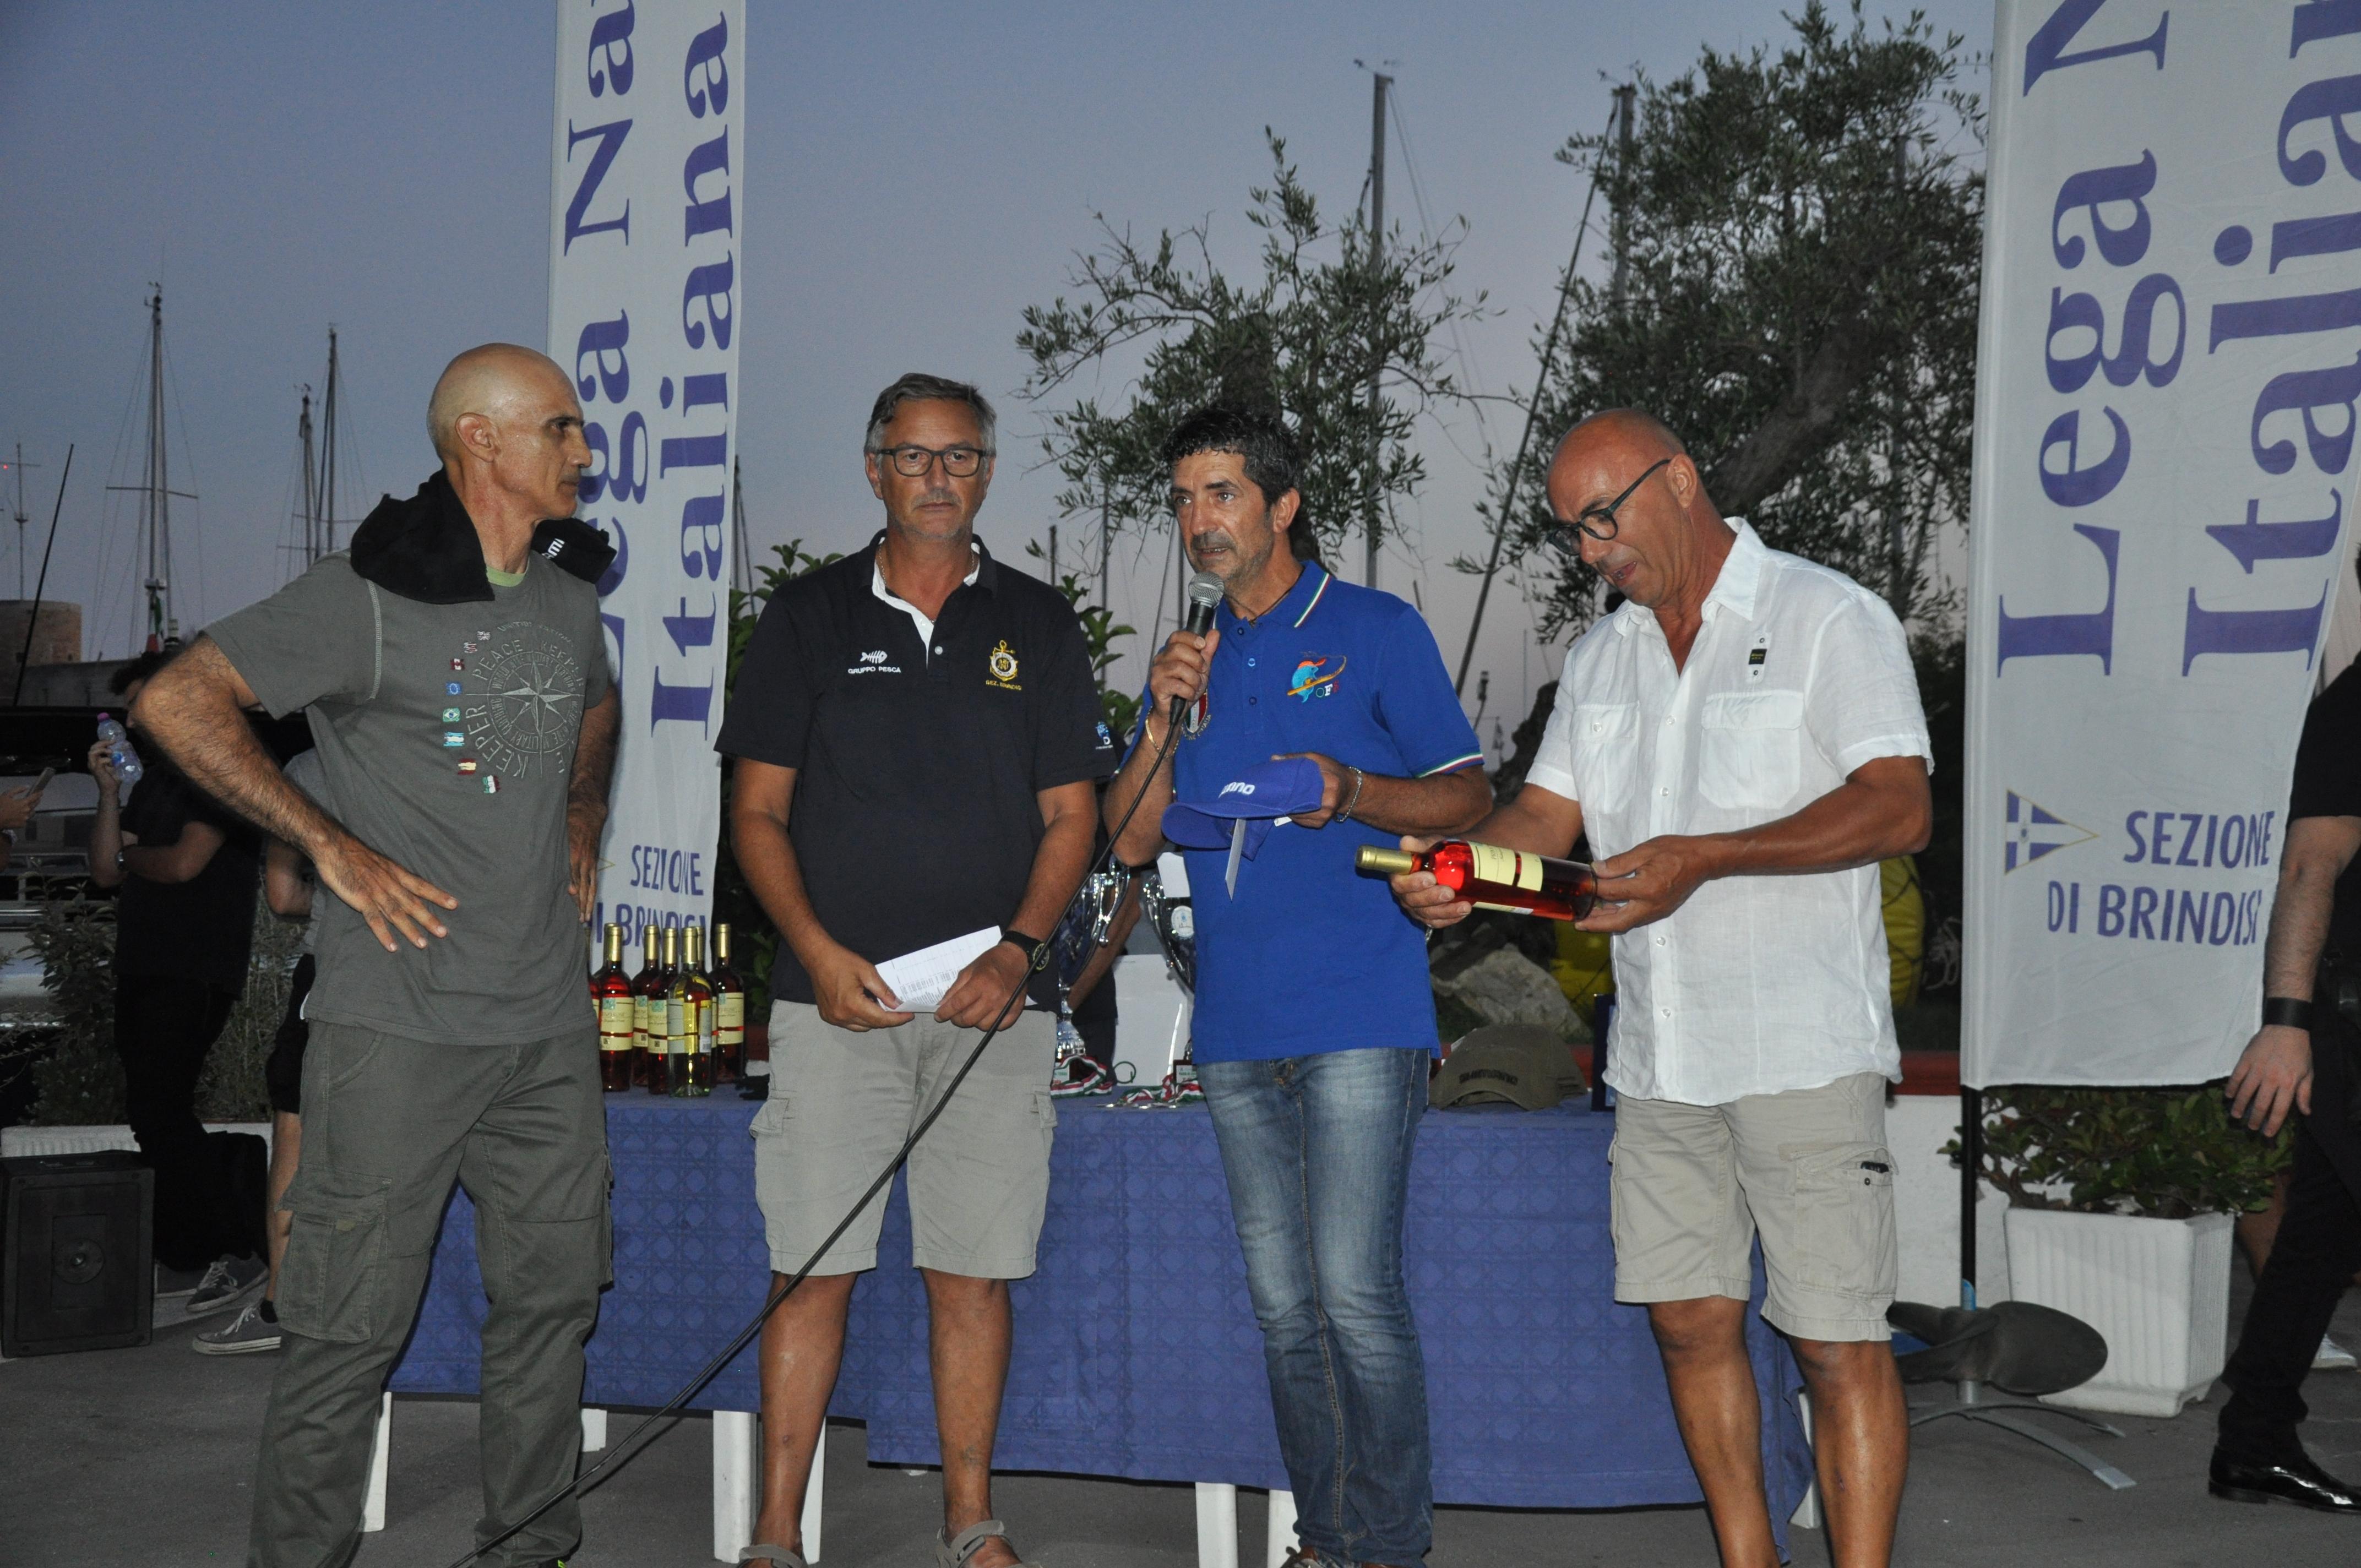 premiazione drifting al tonno 2018 (12)